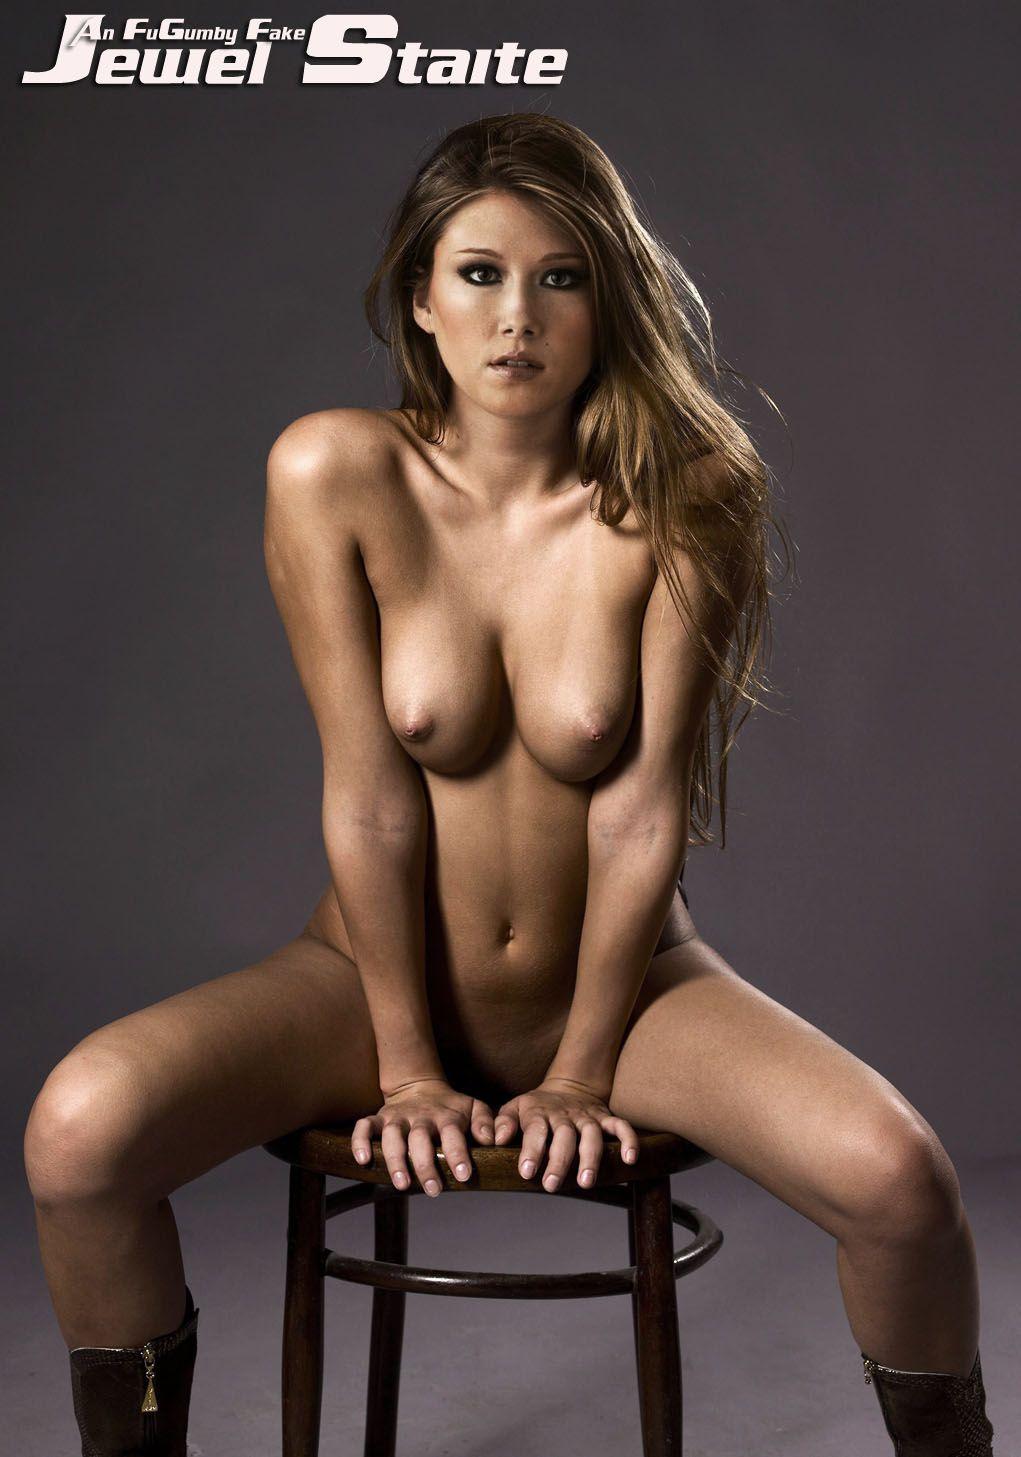 Jewel staite naked